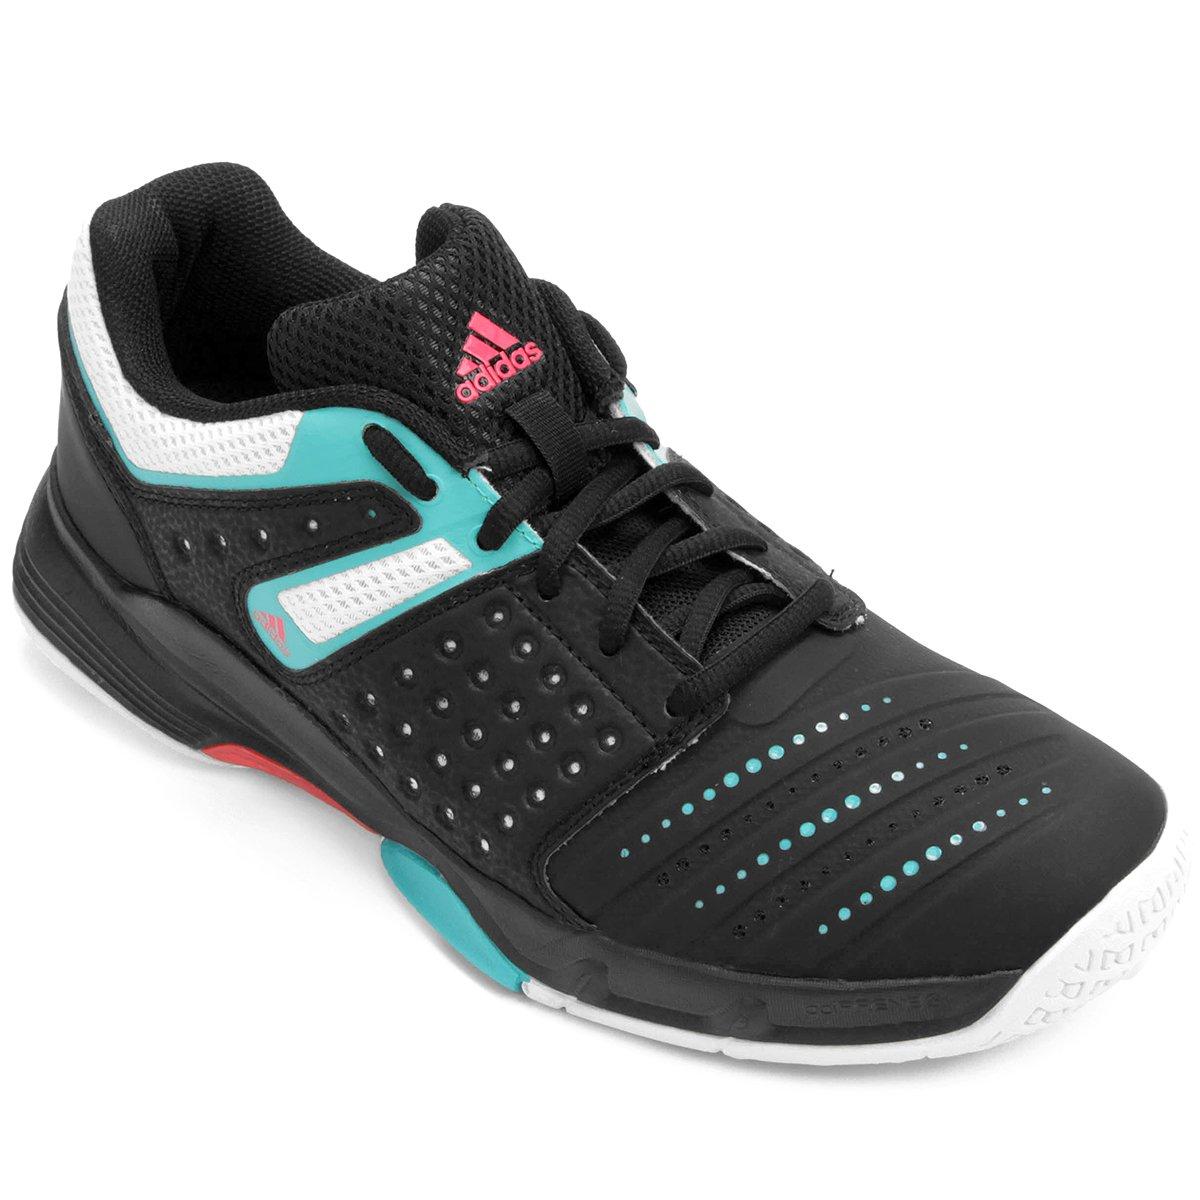 Tênis Adidas Court Stabil 12 W - Compre Agora  f23d216f785